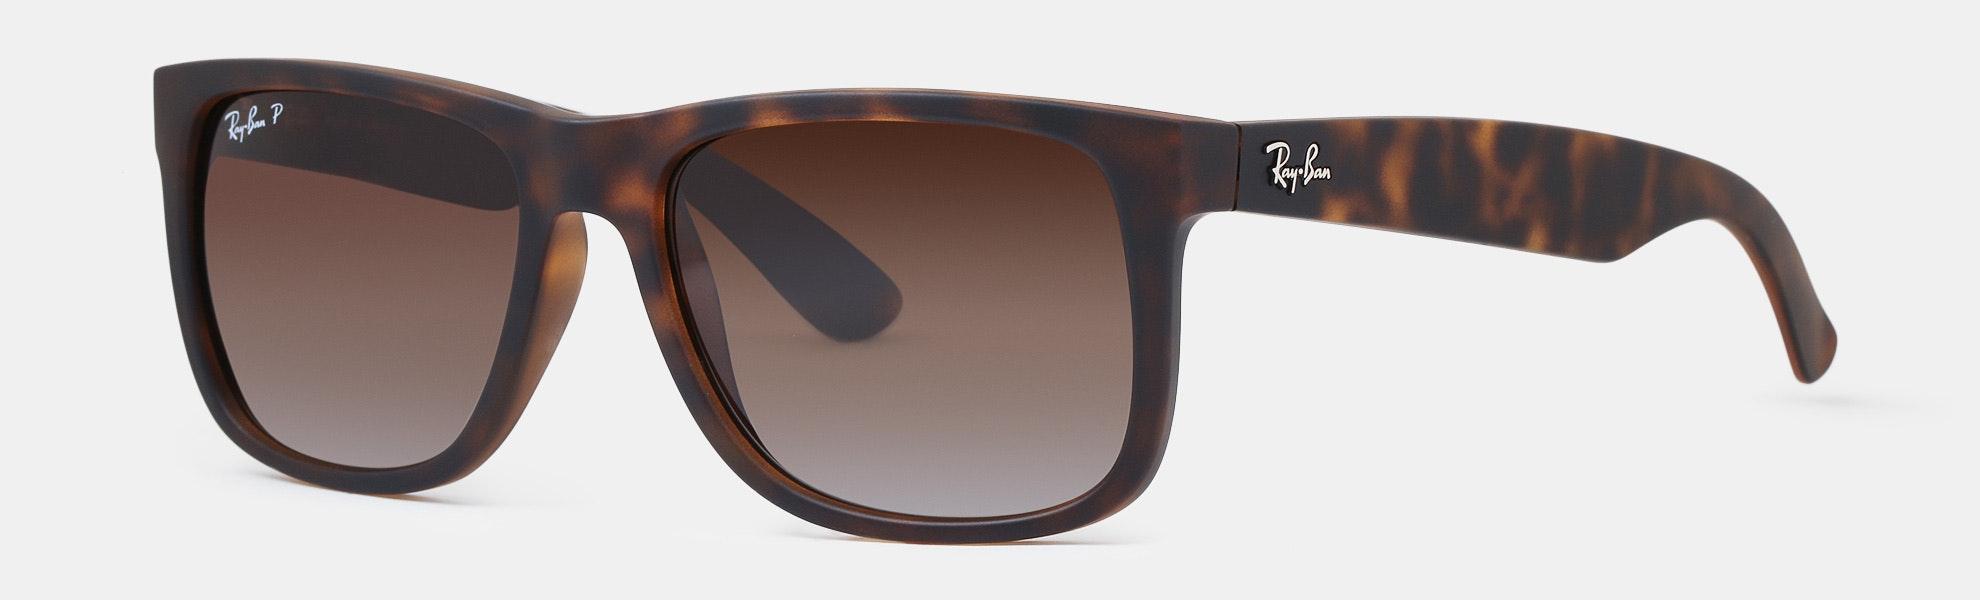 Ray-Ban Justin Polarized Sunglasses